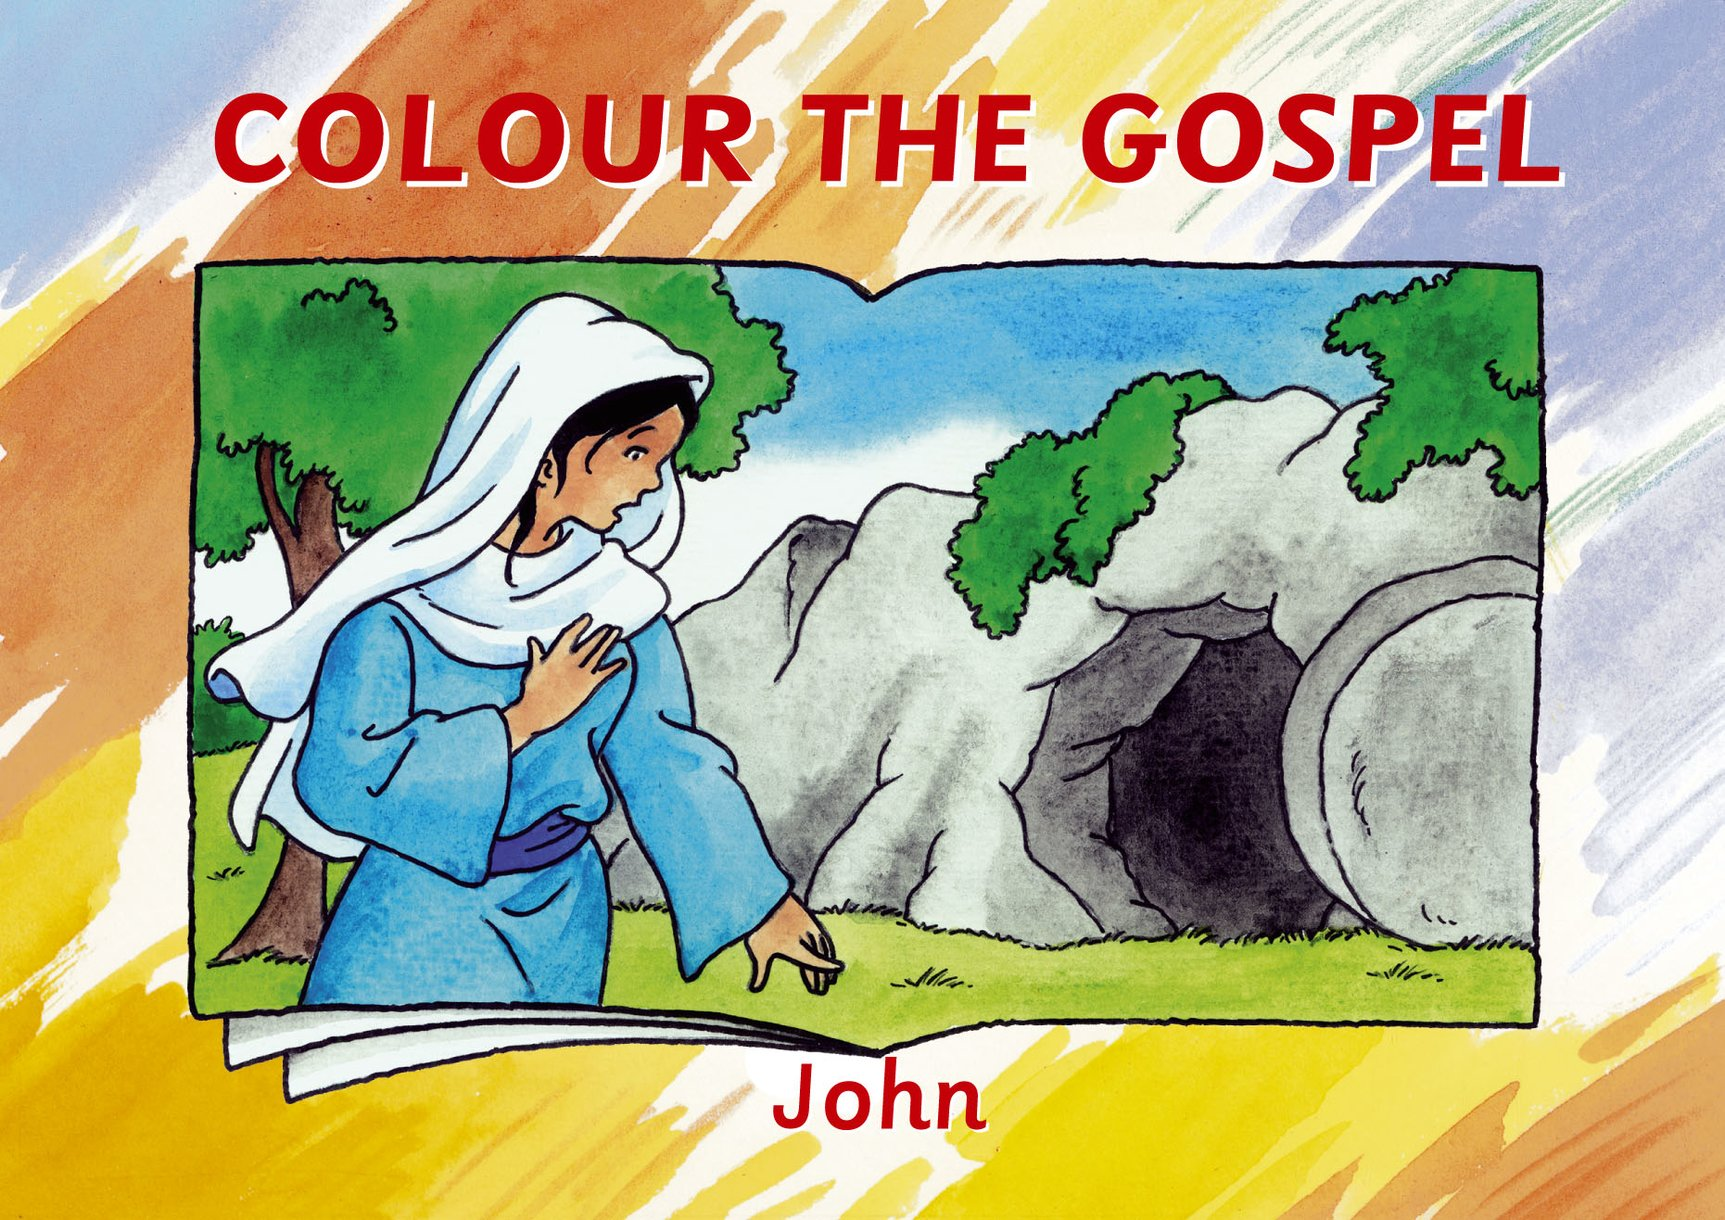 Colour the Gospel: John by Carine MacKenzie - Christian Focus